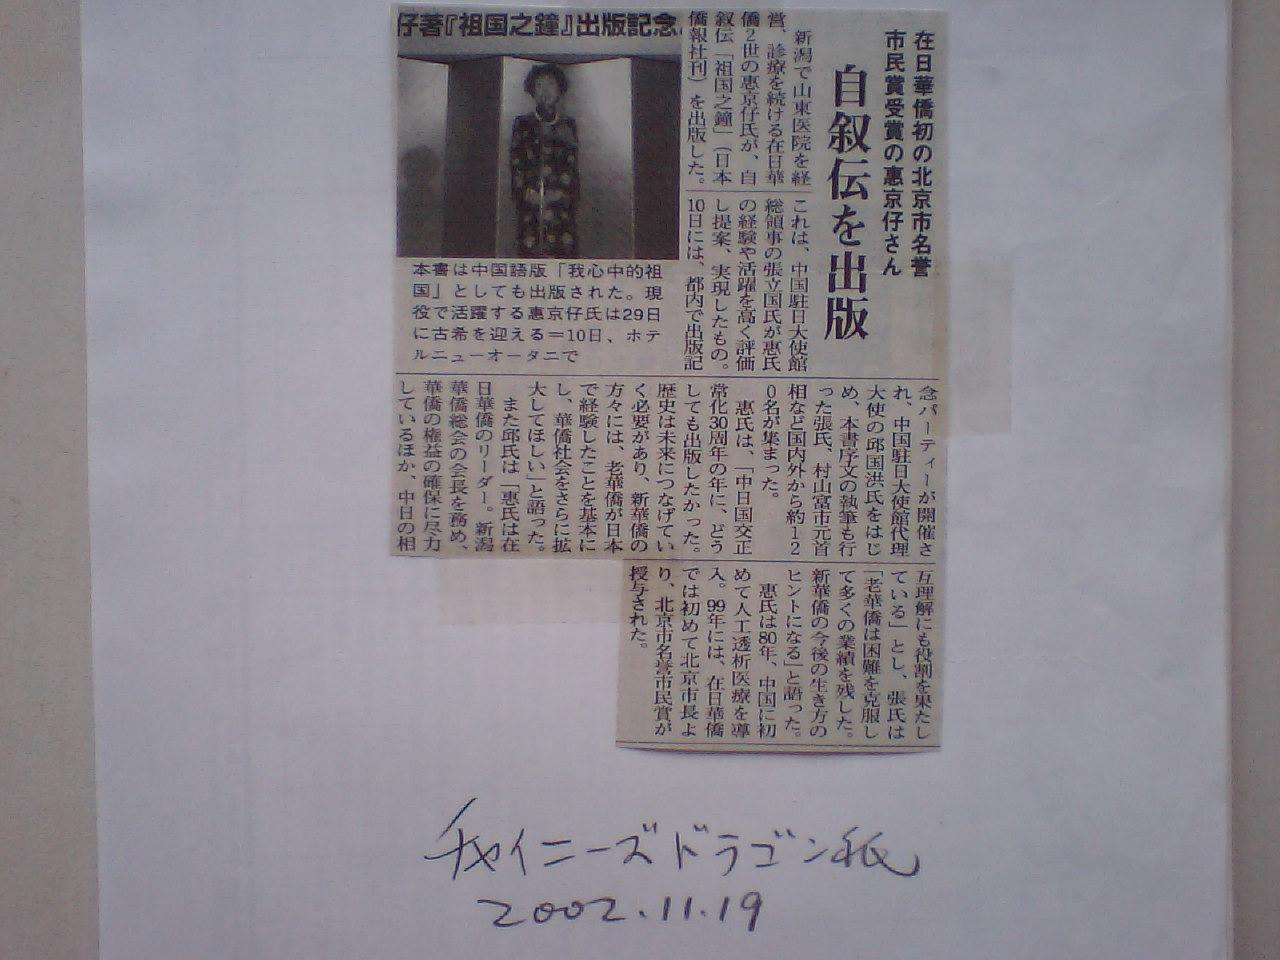 旧聞新録 惠京仔著『祖国之鐘』出版に関する報道記事_d0027795_1642337.jpg